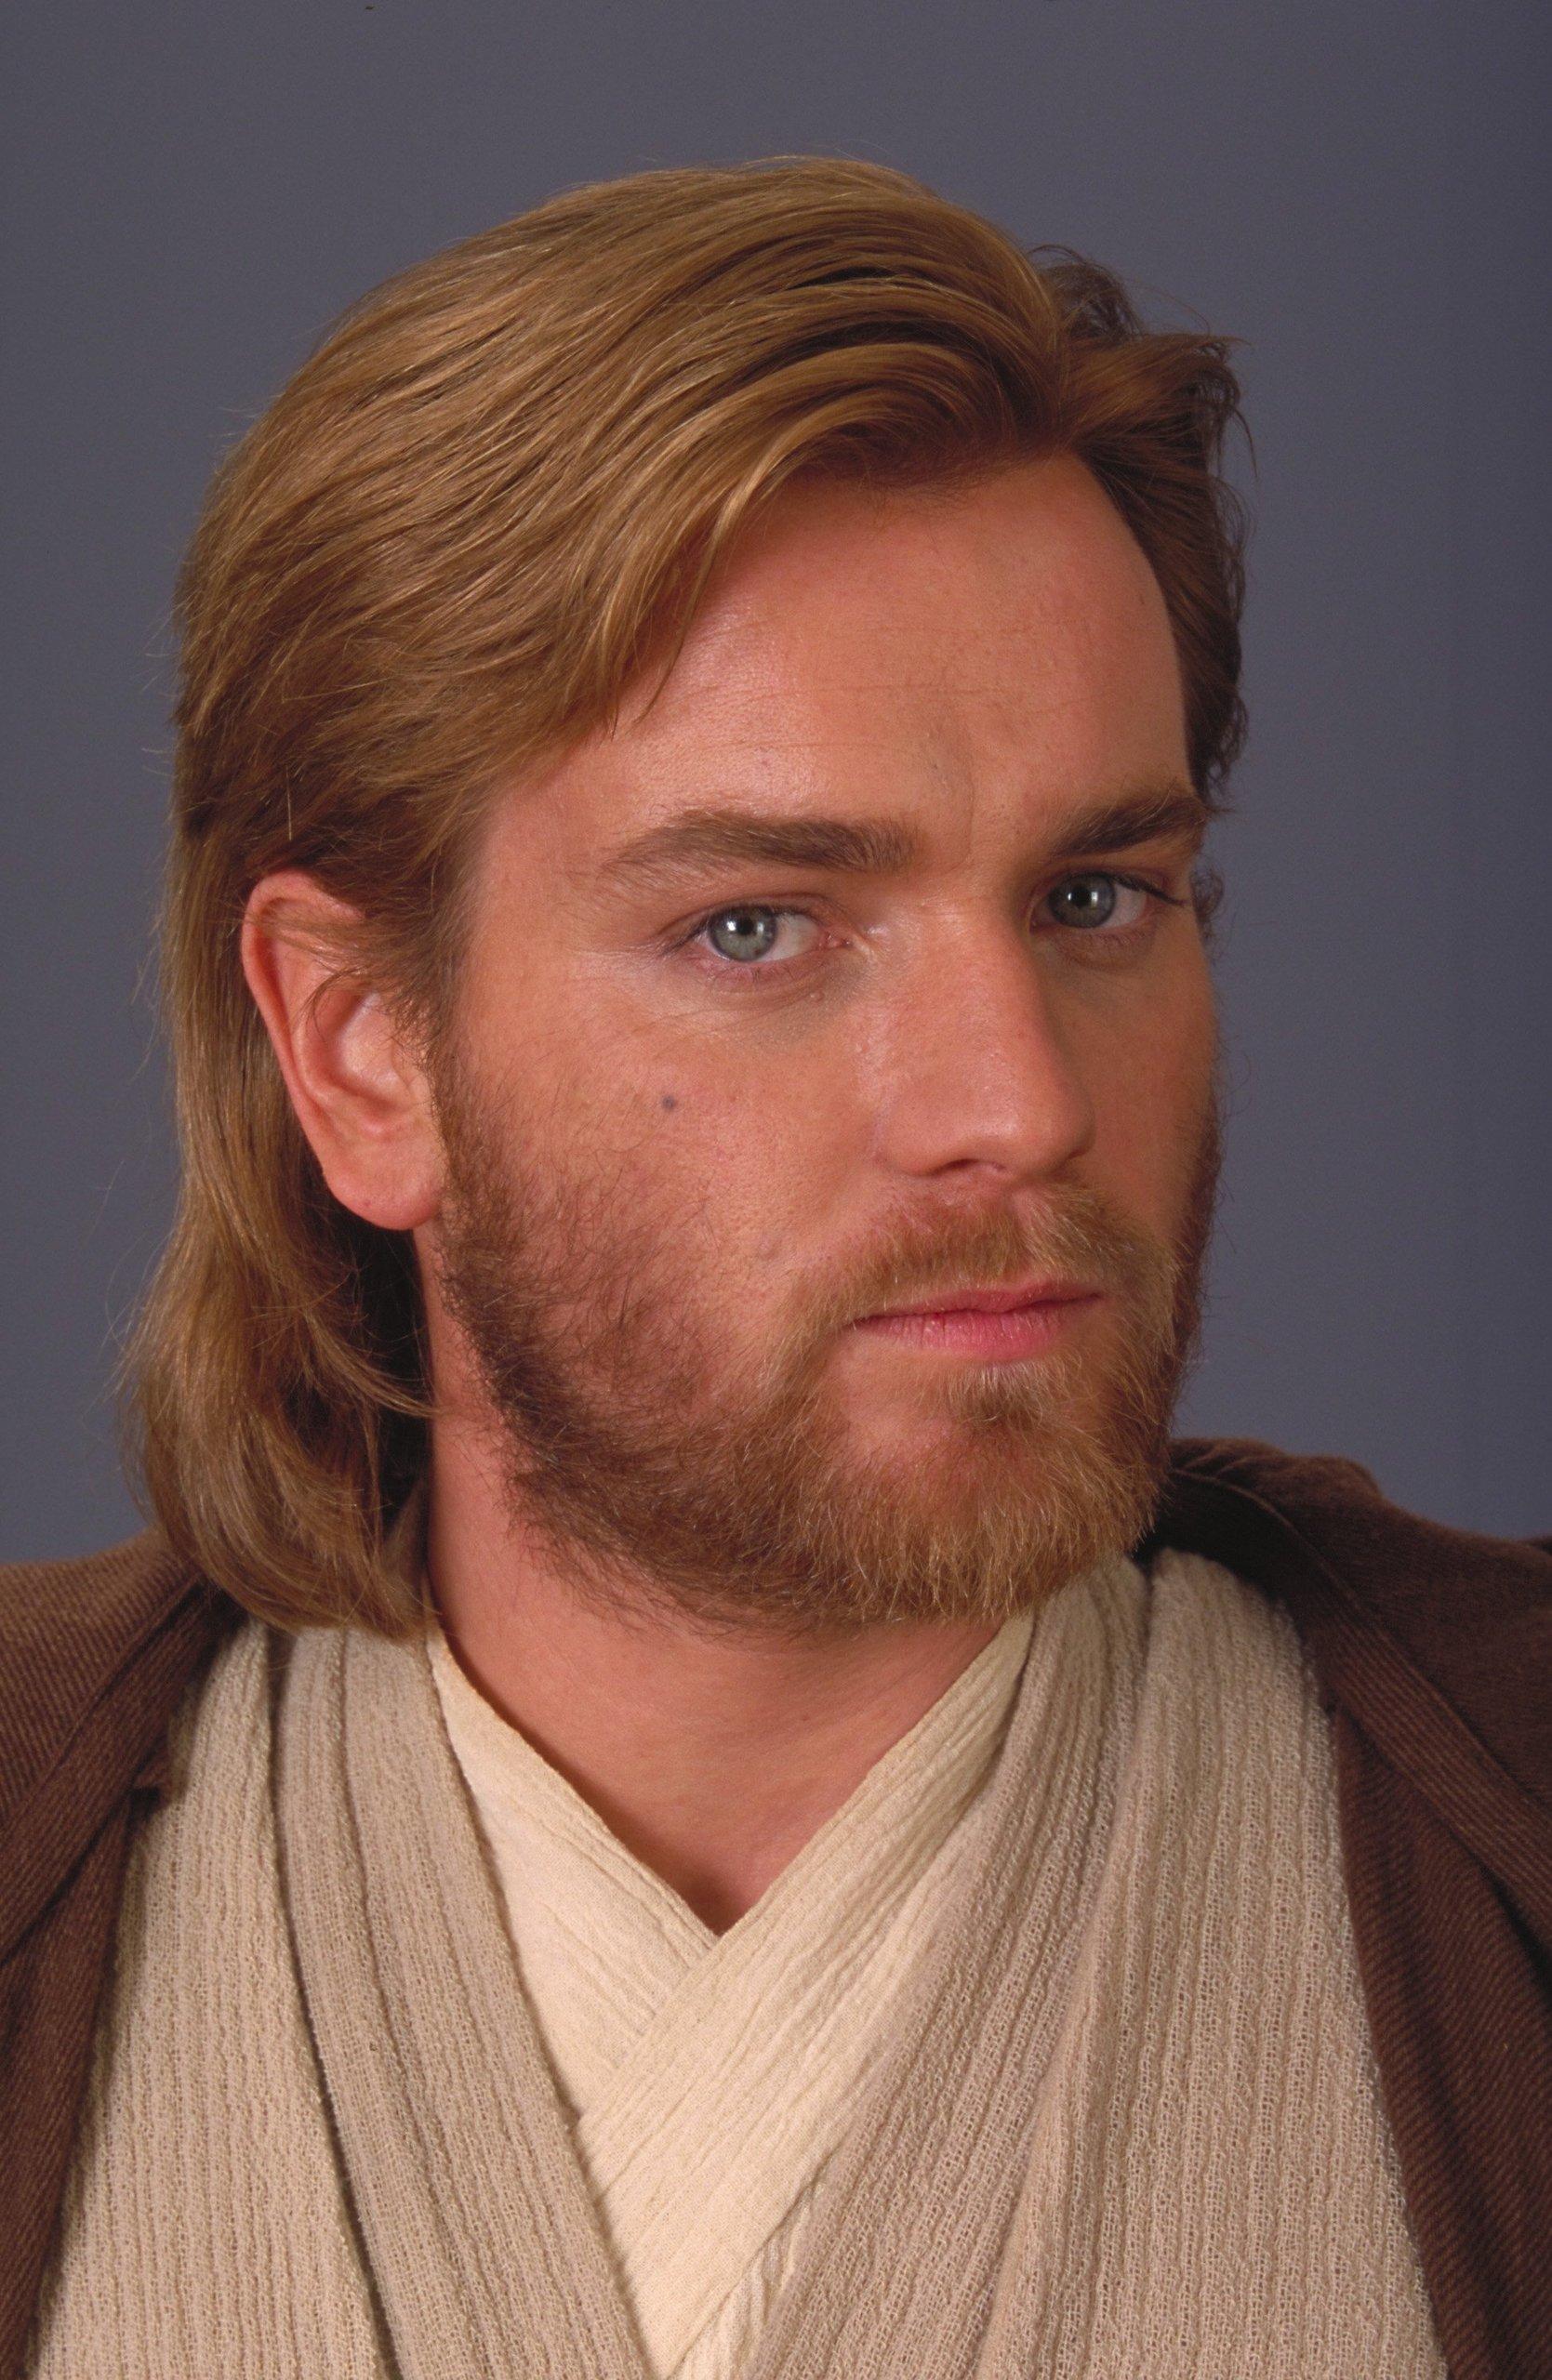 Mbti Obi Wan Kenobi Enfj Zombies Ruin Everything Picture Of As The